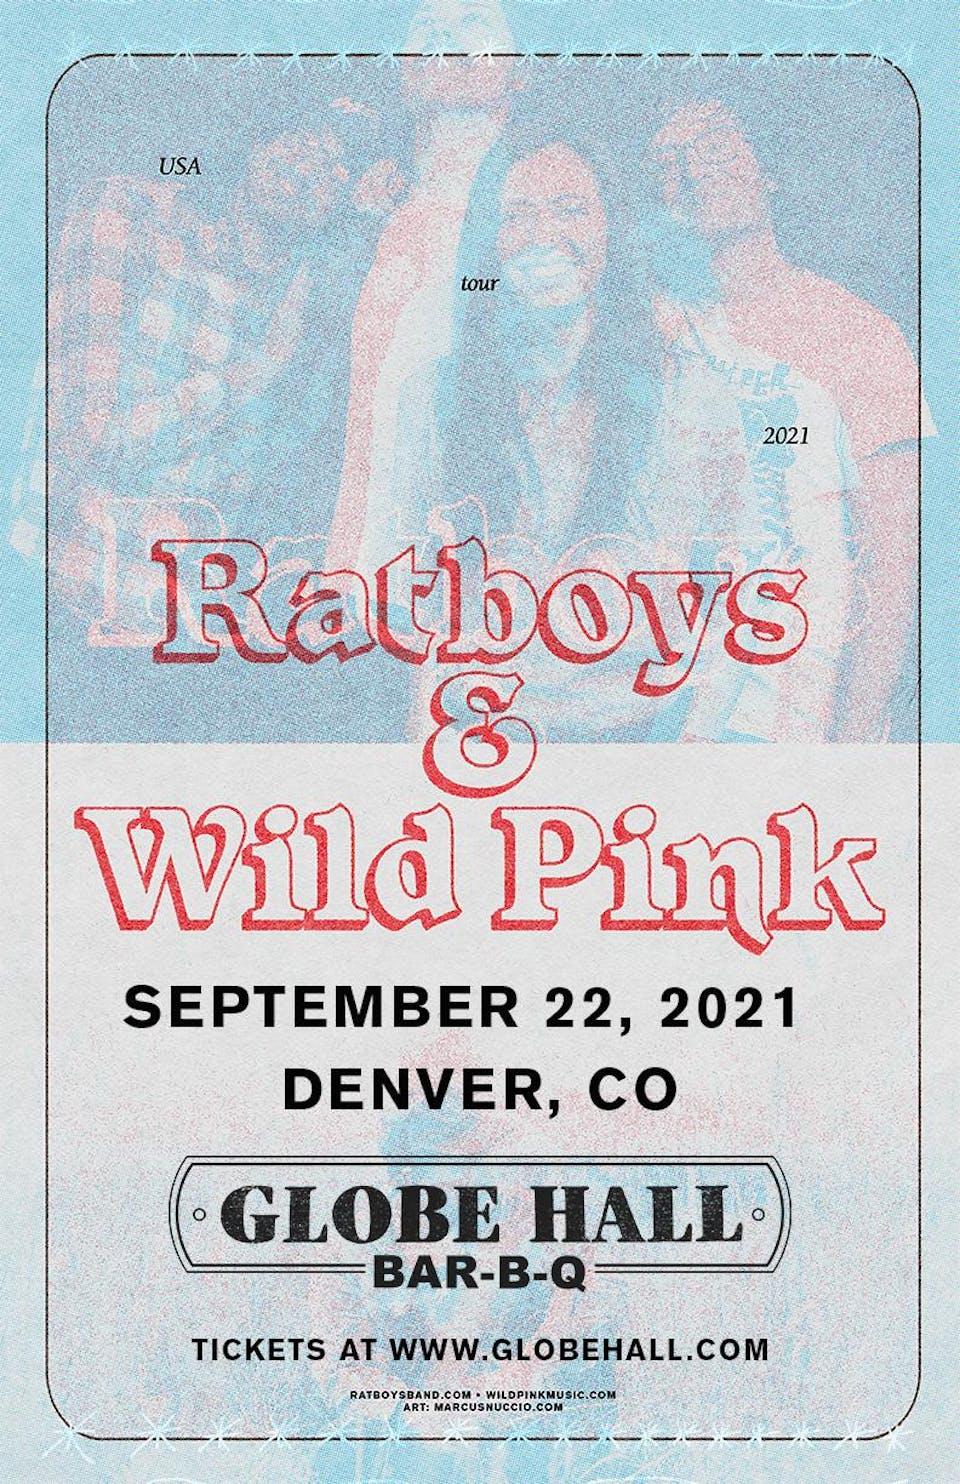 Ratboys / Wild Pink